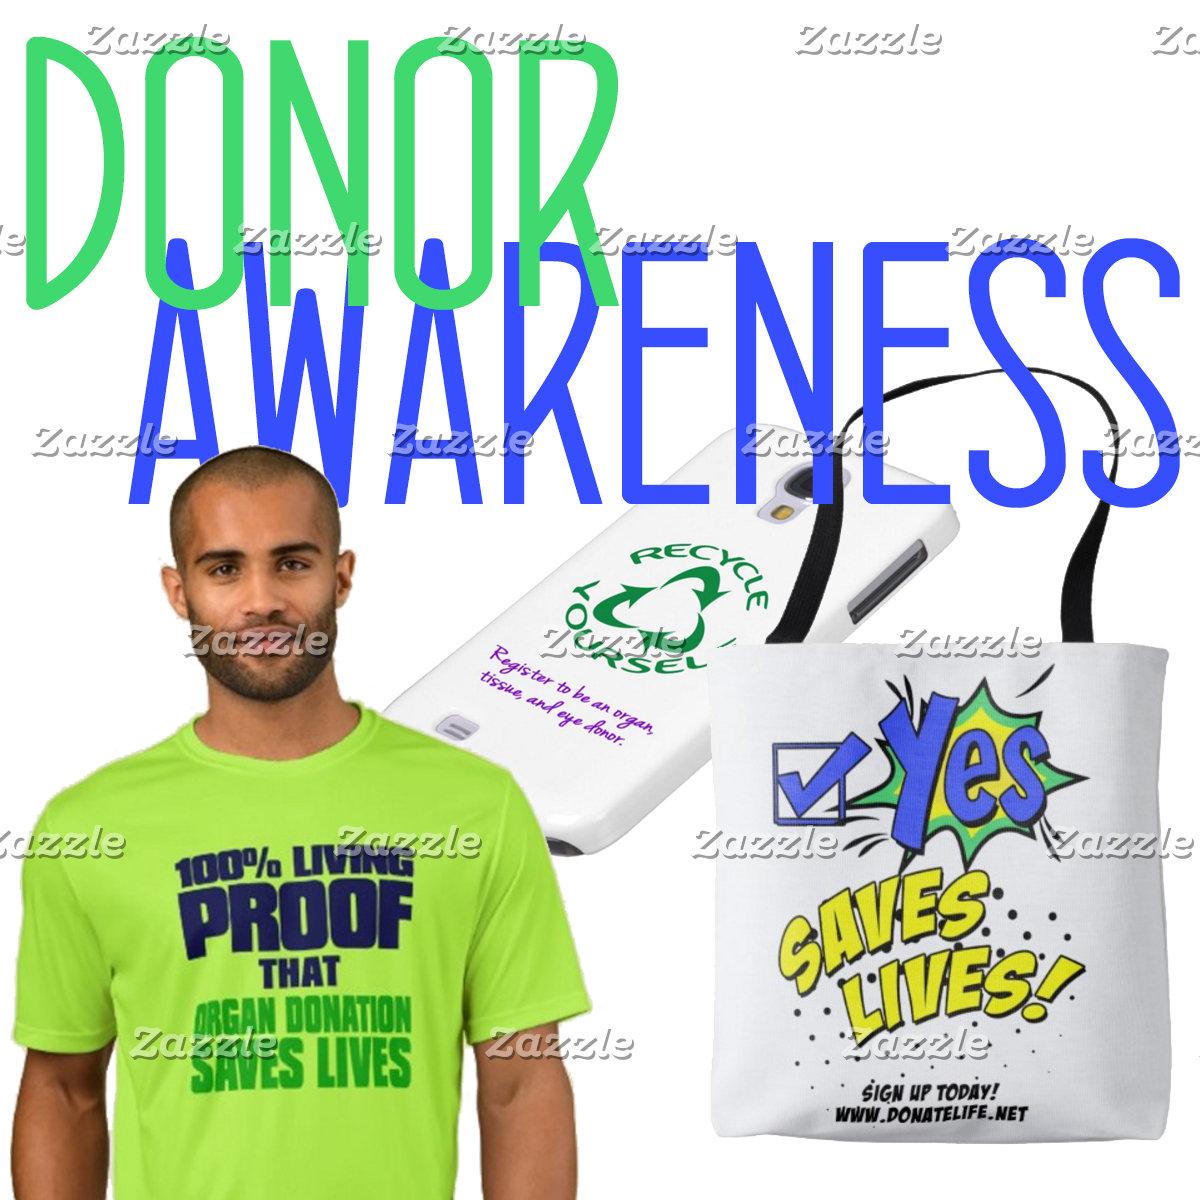 Transplant/Donor Awareness